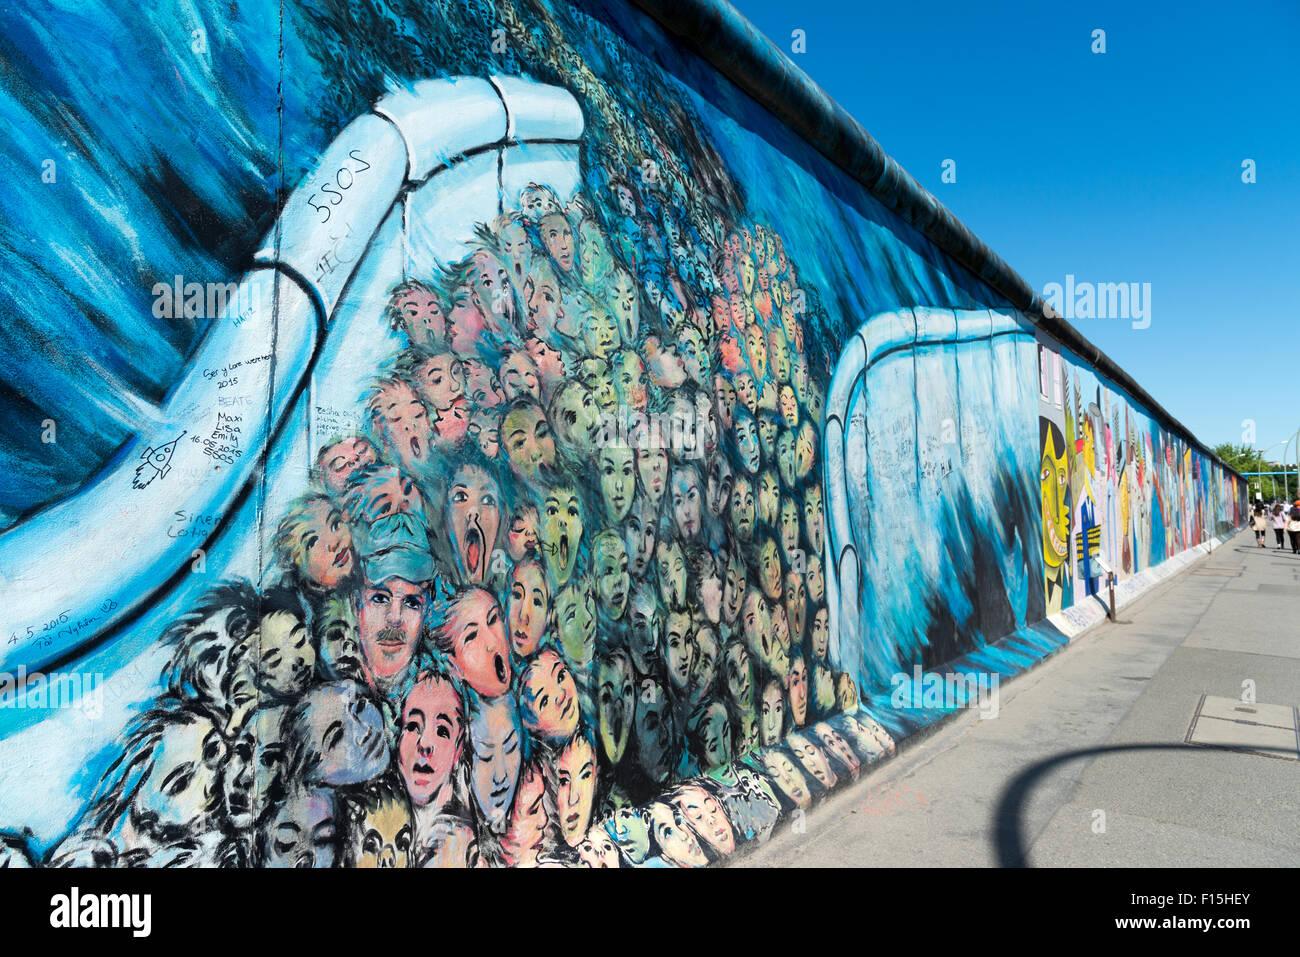 The Berlin Wall East Side Gallery, Berlin, Germany - Stock Image